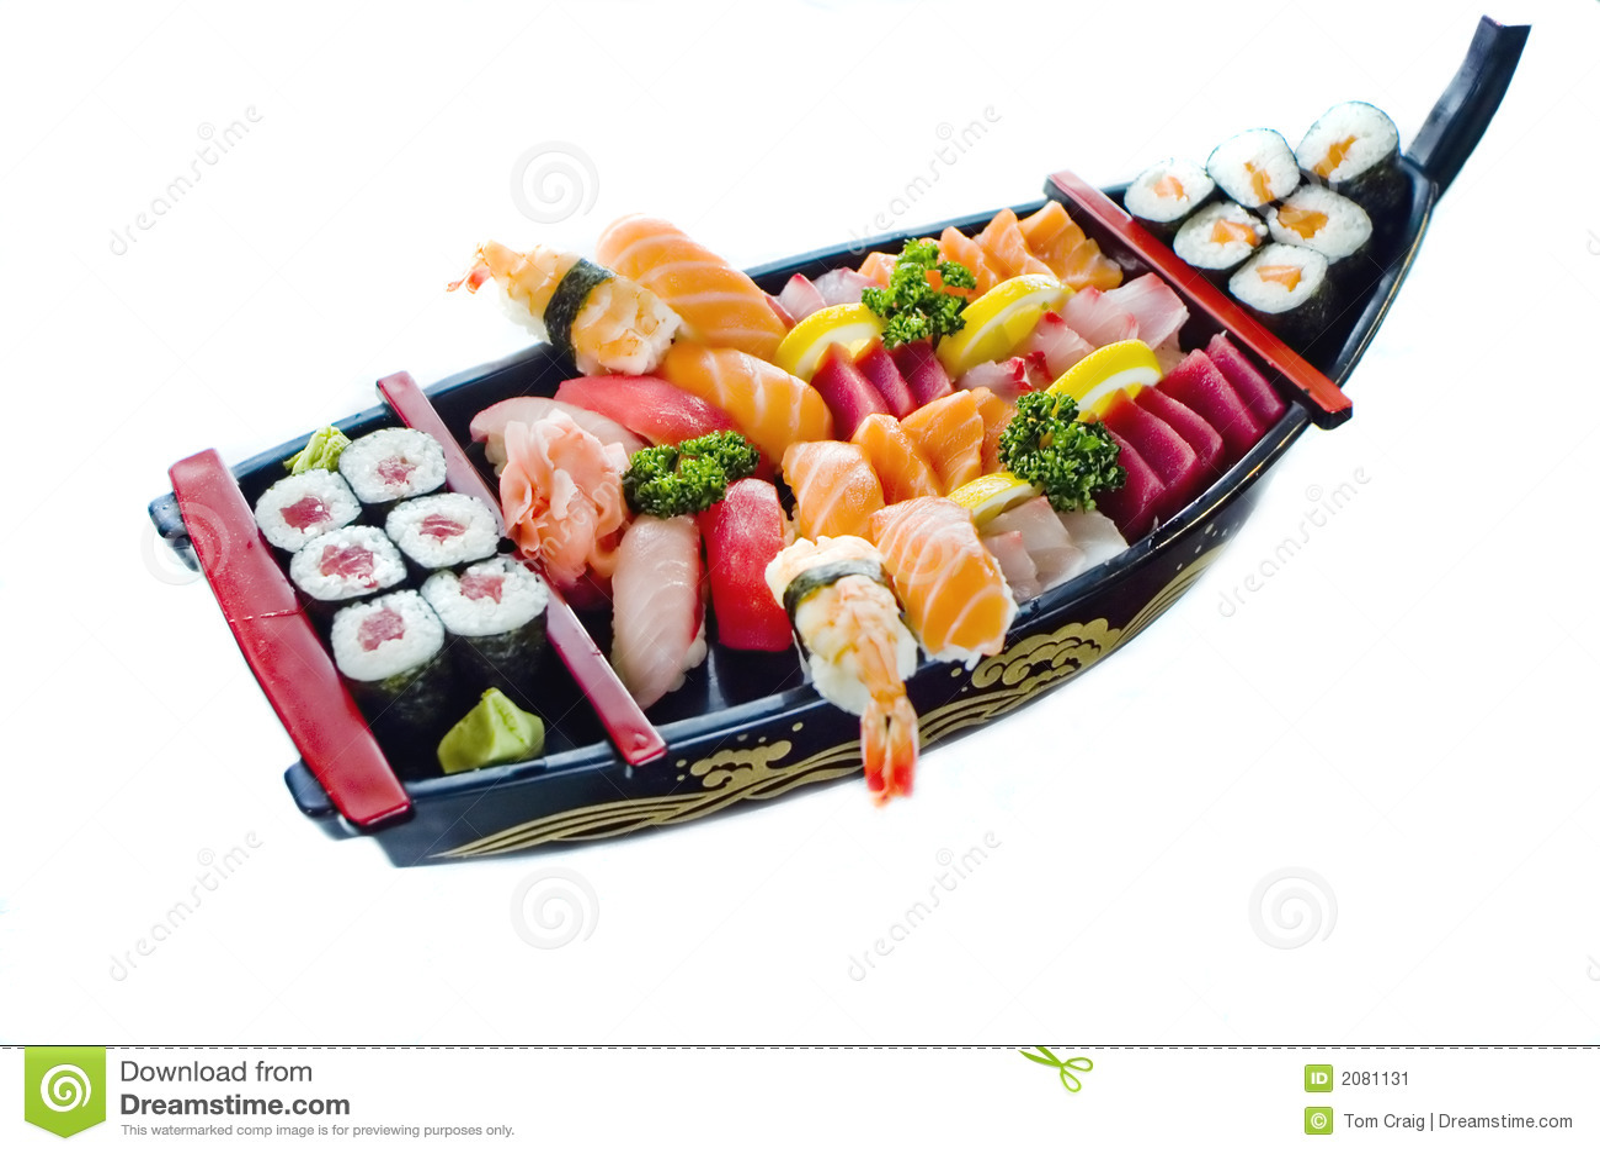 Stock Photo of japanese Food,